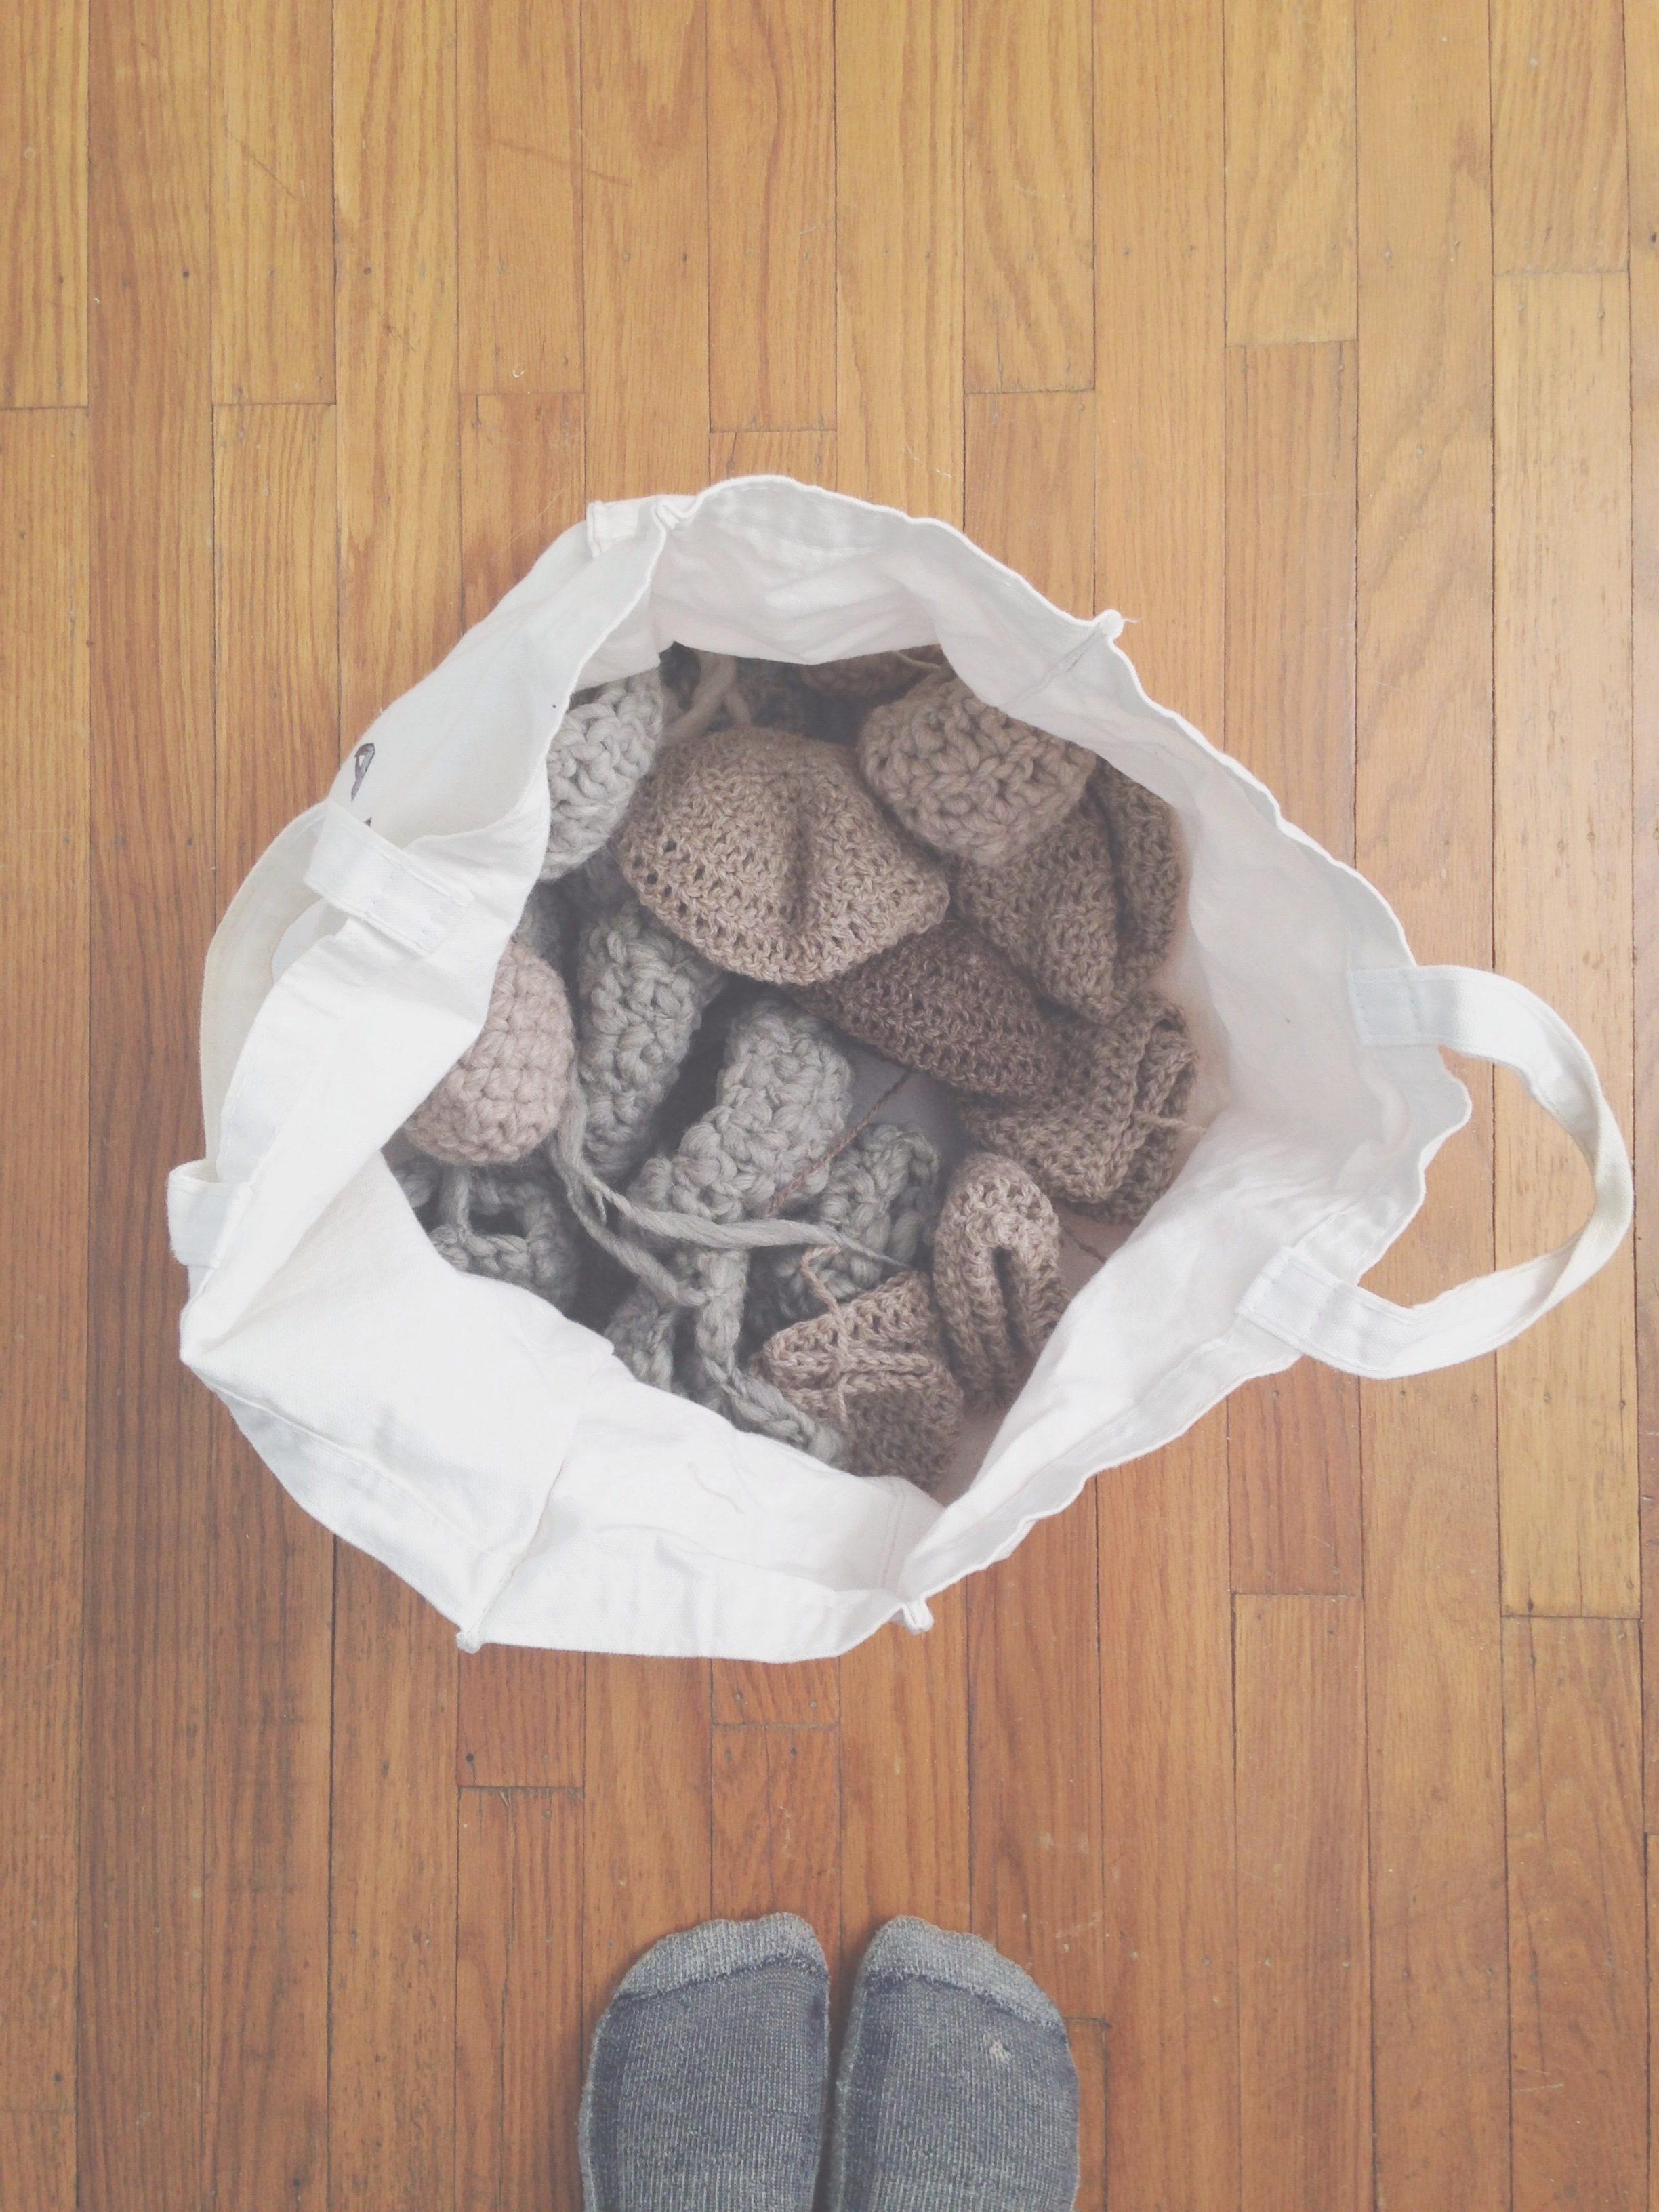 Malachos crocheted pieces in progress.